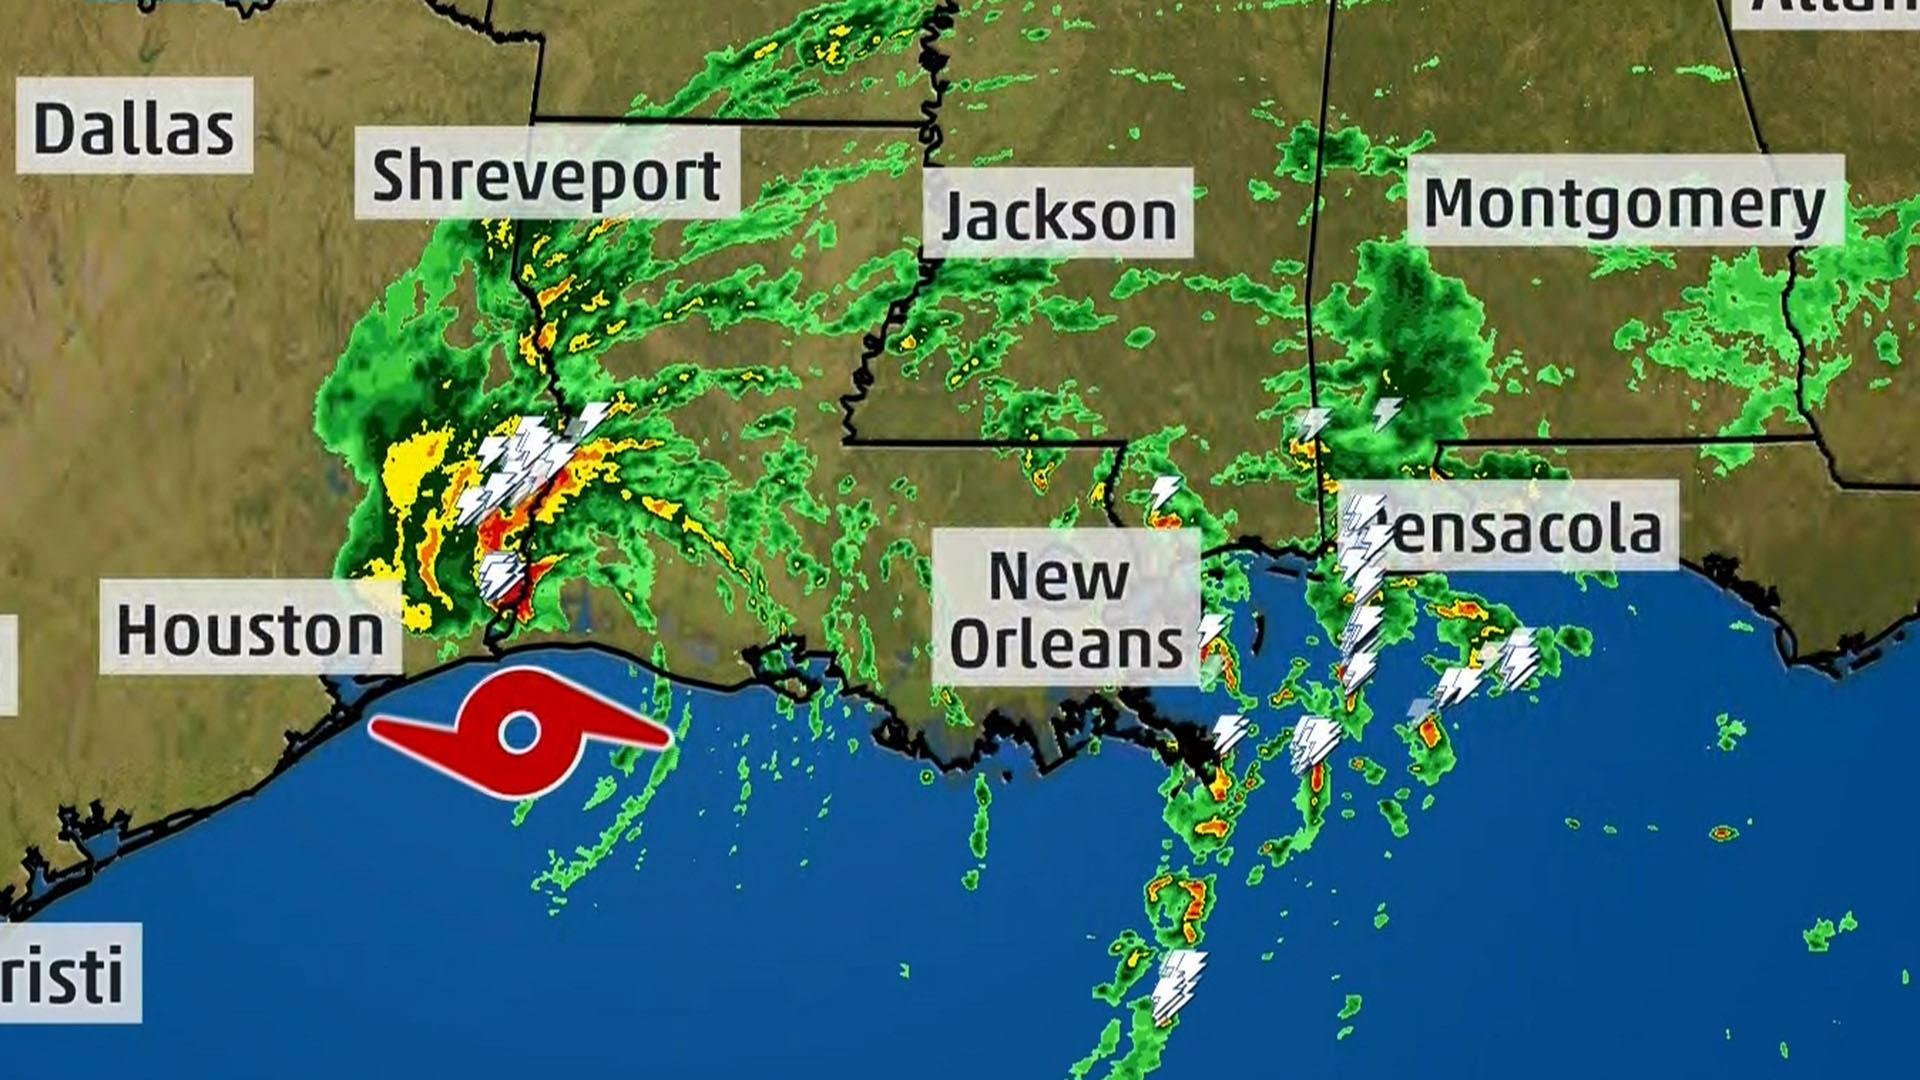 Watch Live Harveys Rainfall On Weather Radar LatestNewsNetworkcom - Shreveport weather radar live